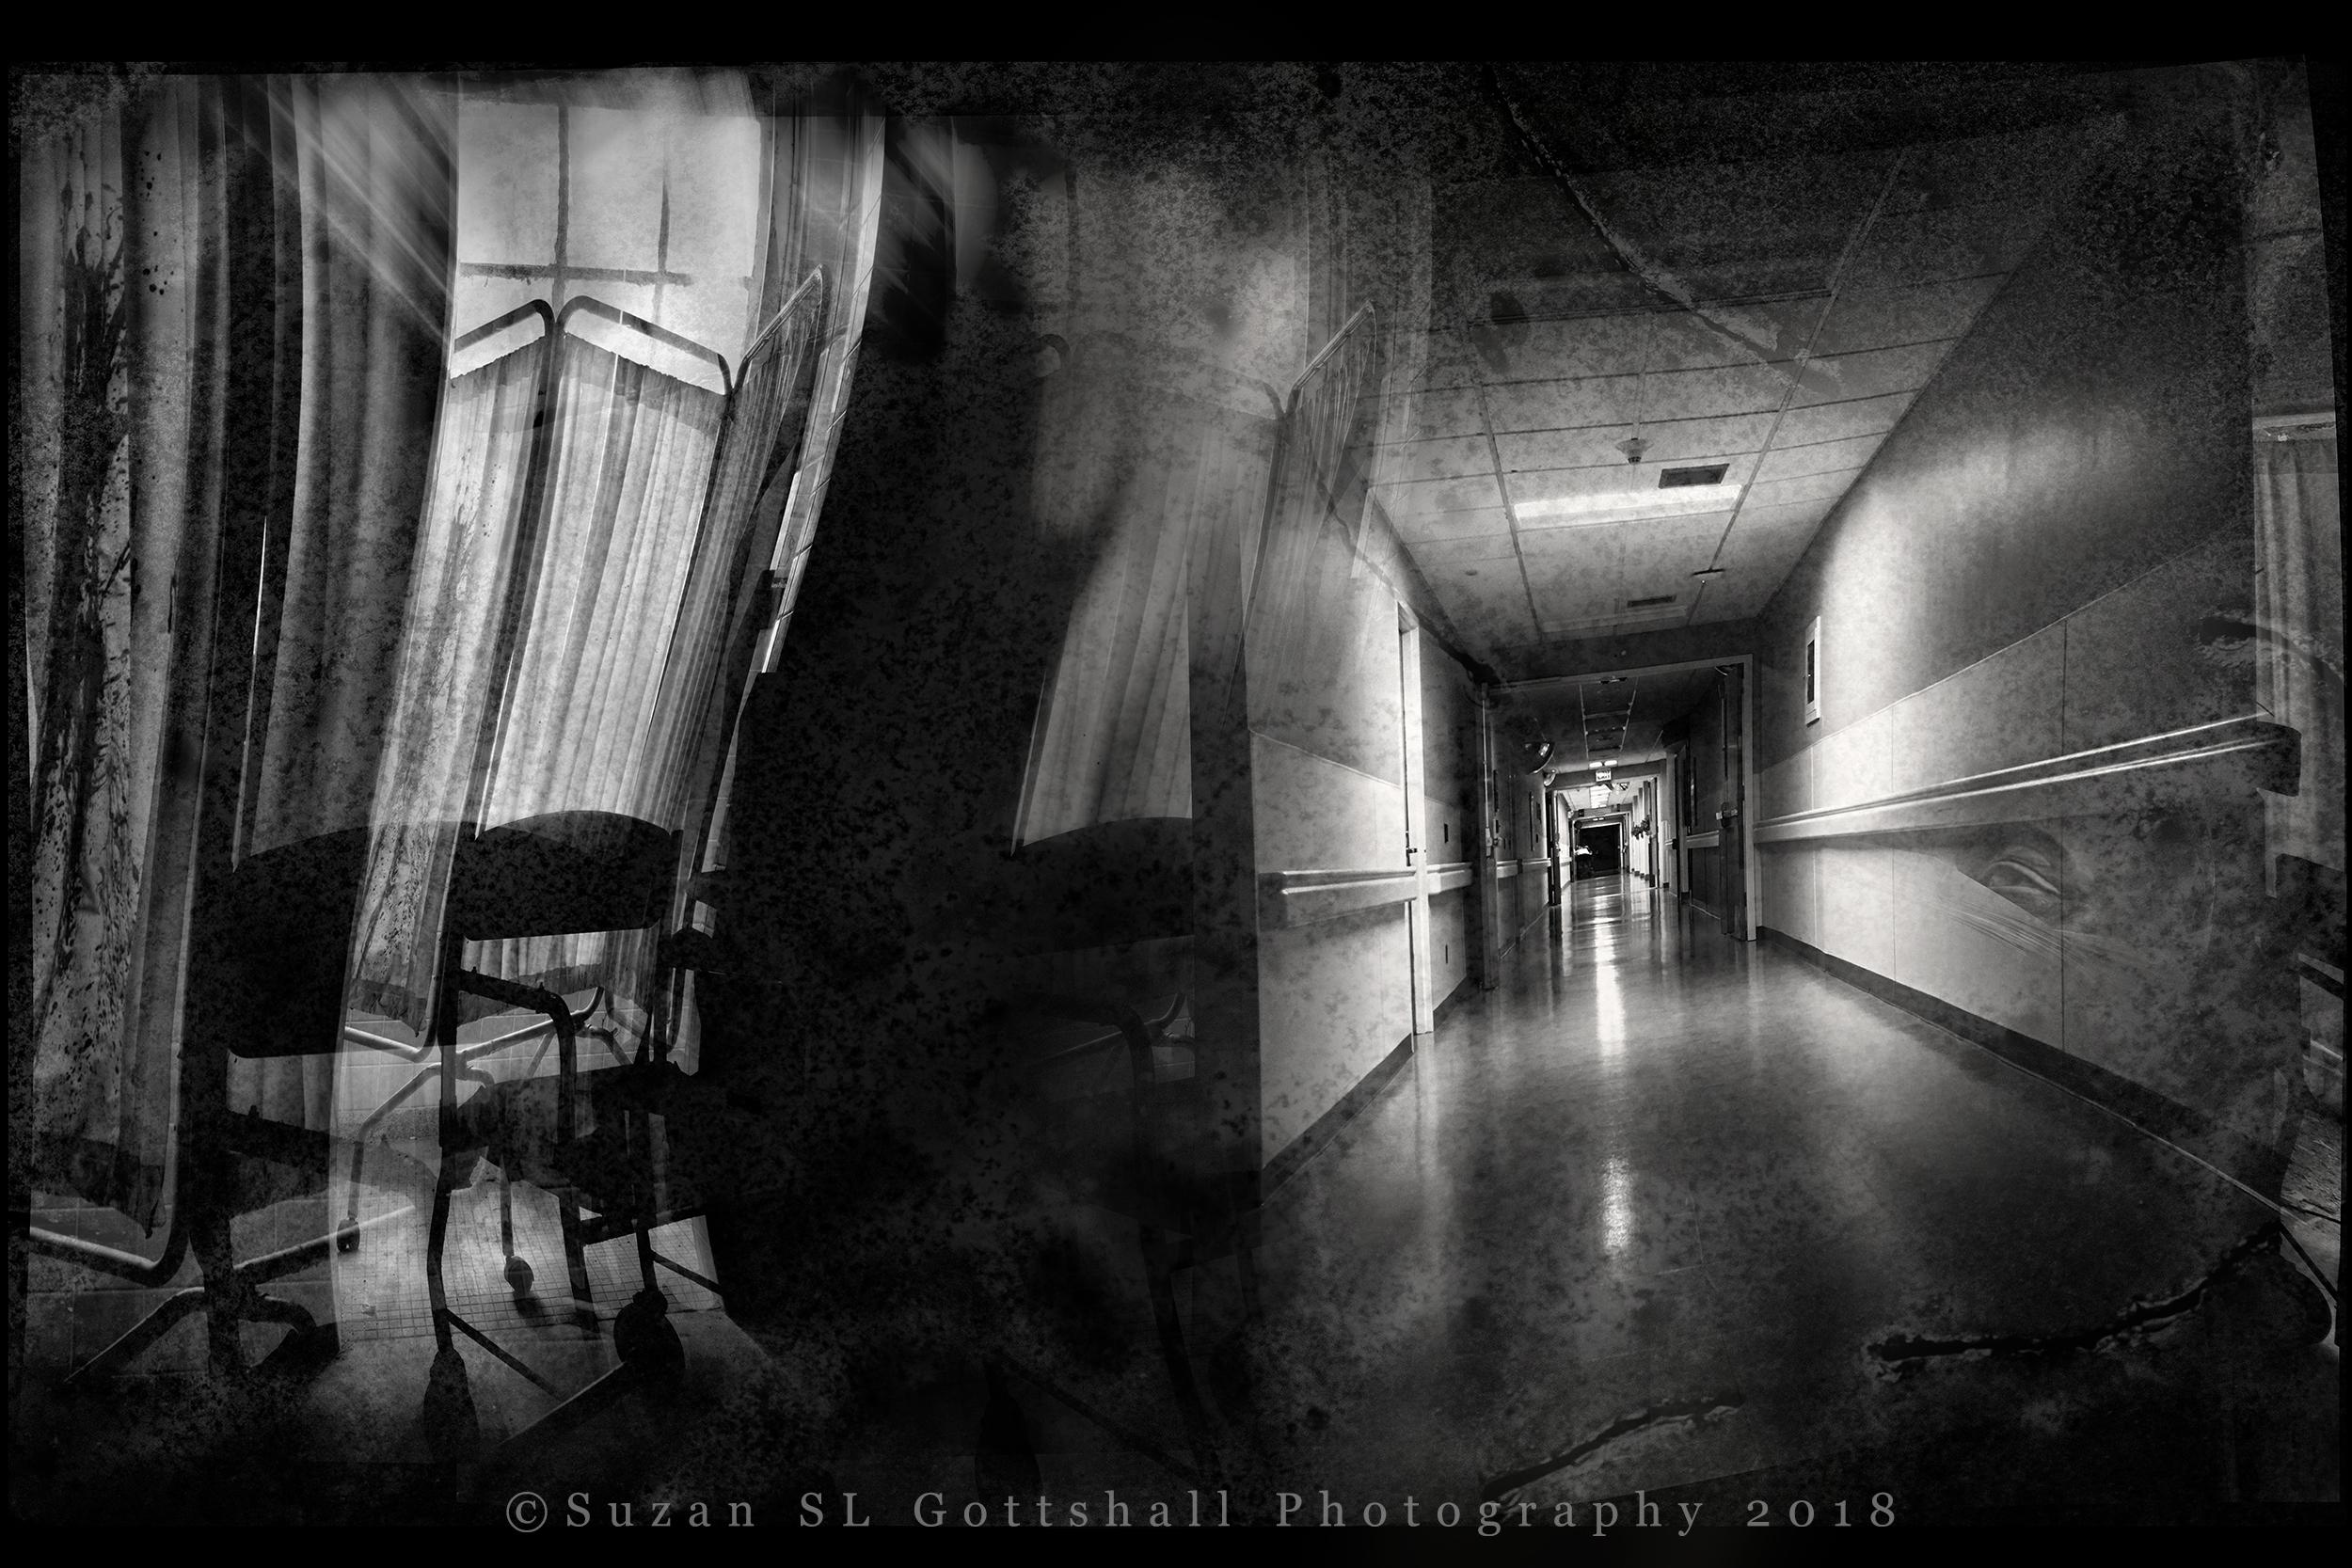 ws_dark_side_of_the_room_©suzanslgottshall_.jpg